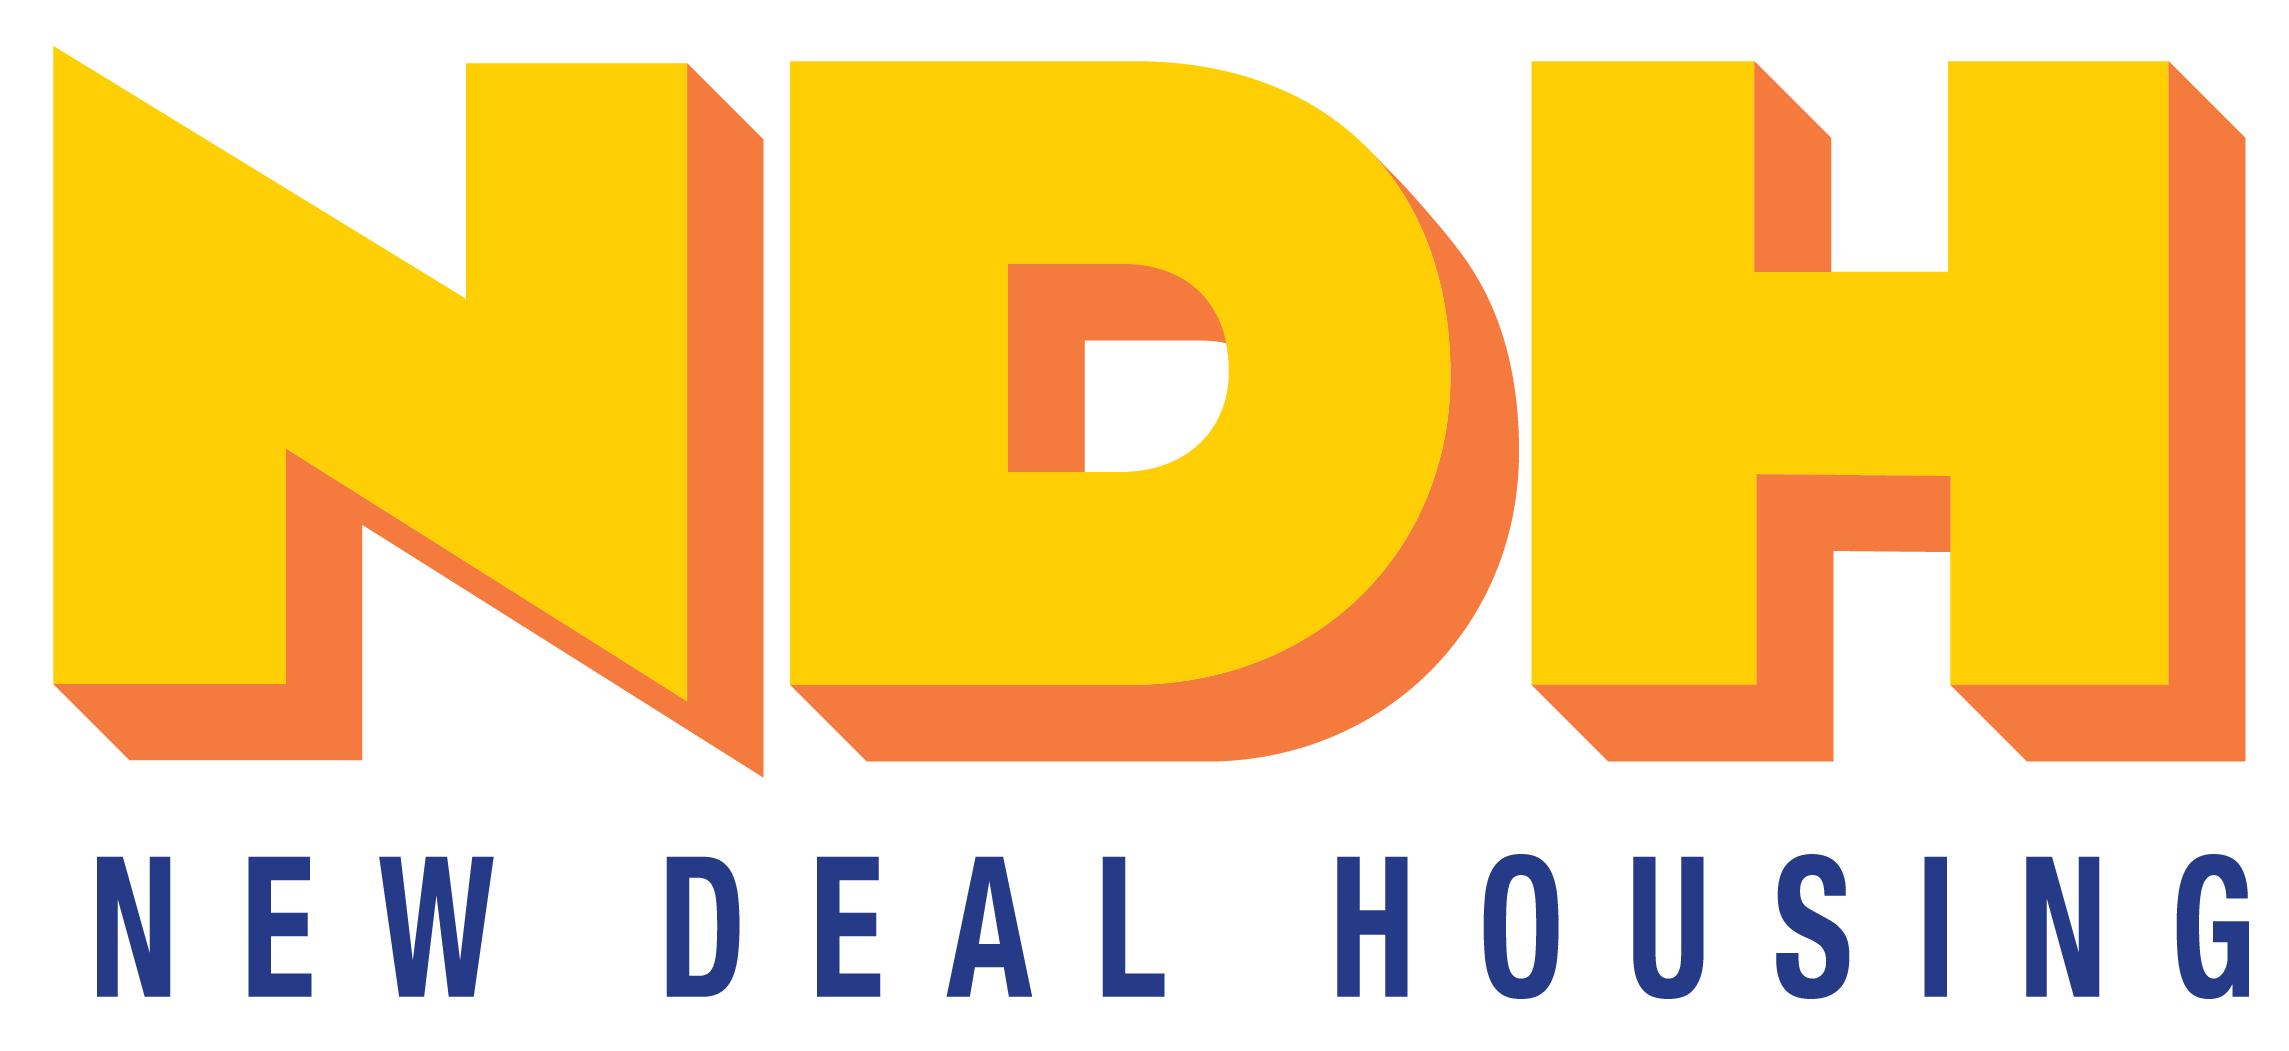 NDH logo-final_large-01.png